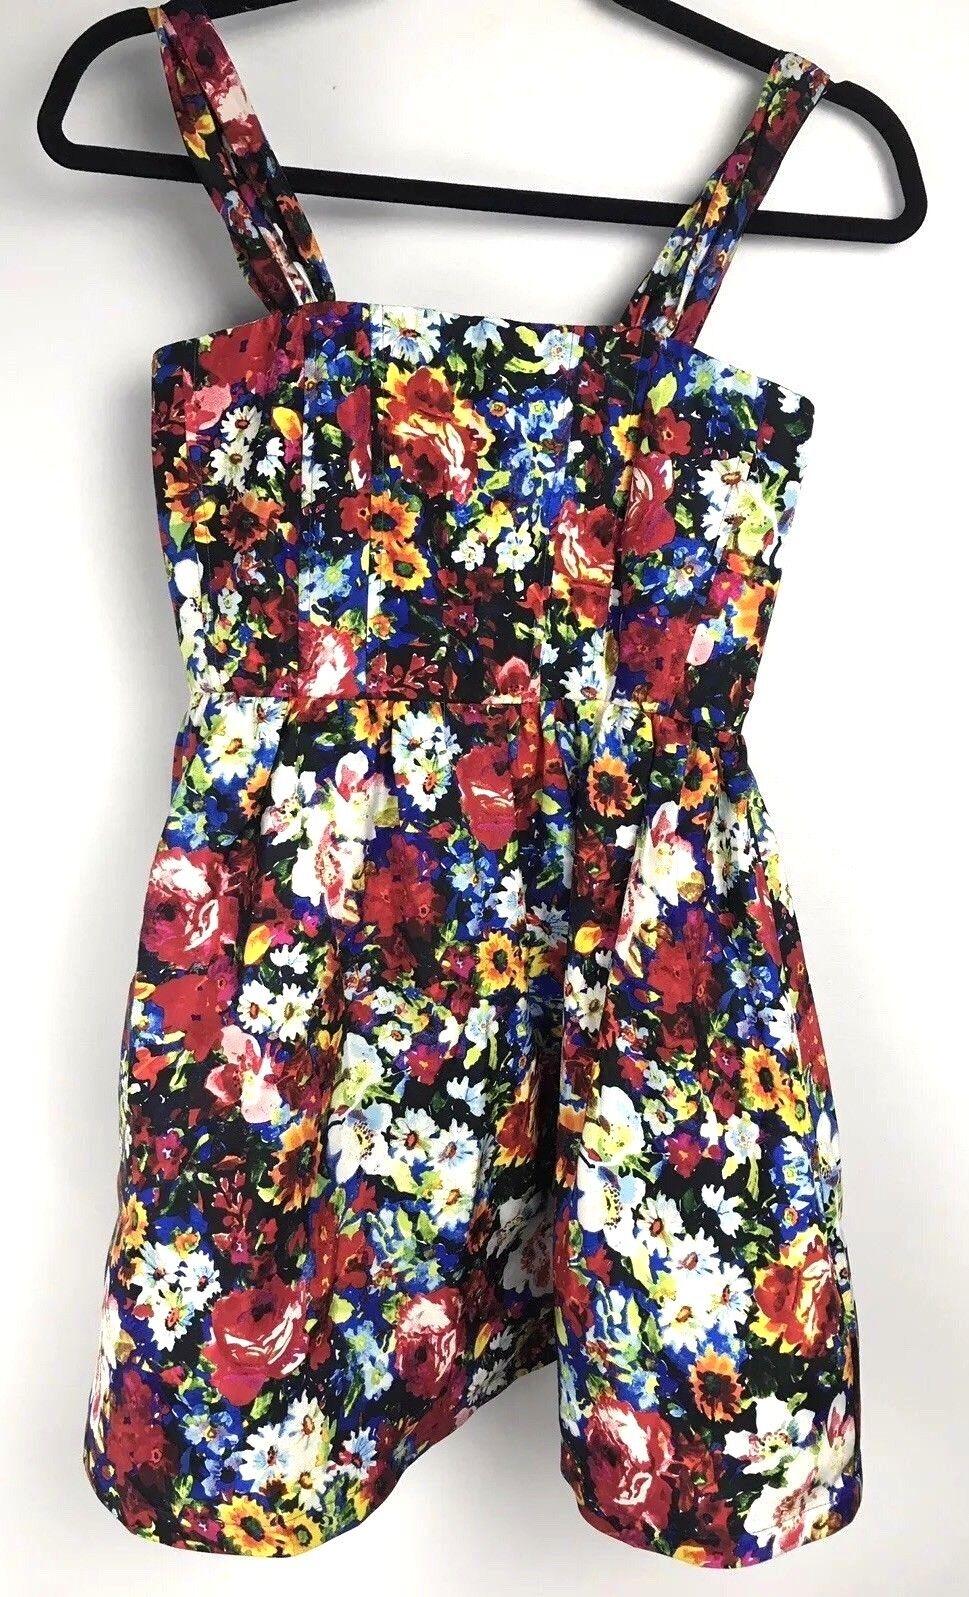 Alice + Olivia Madeline FULL SKIRT Dress Größe X-SMALL